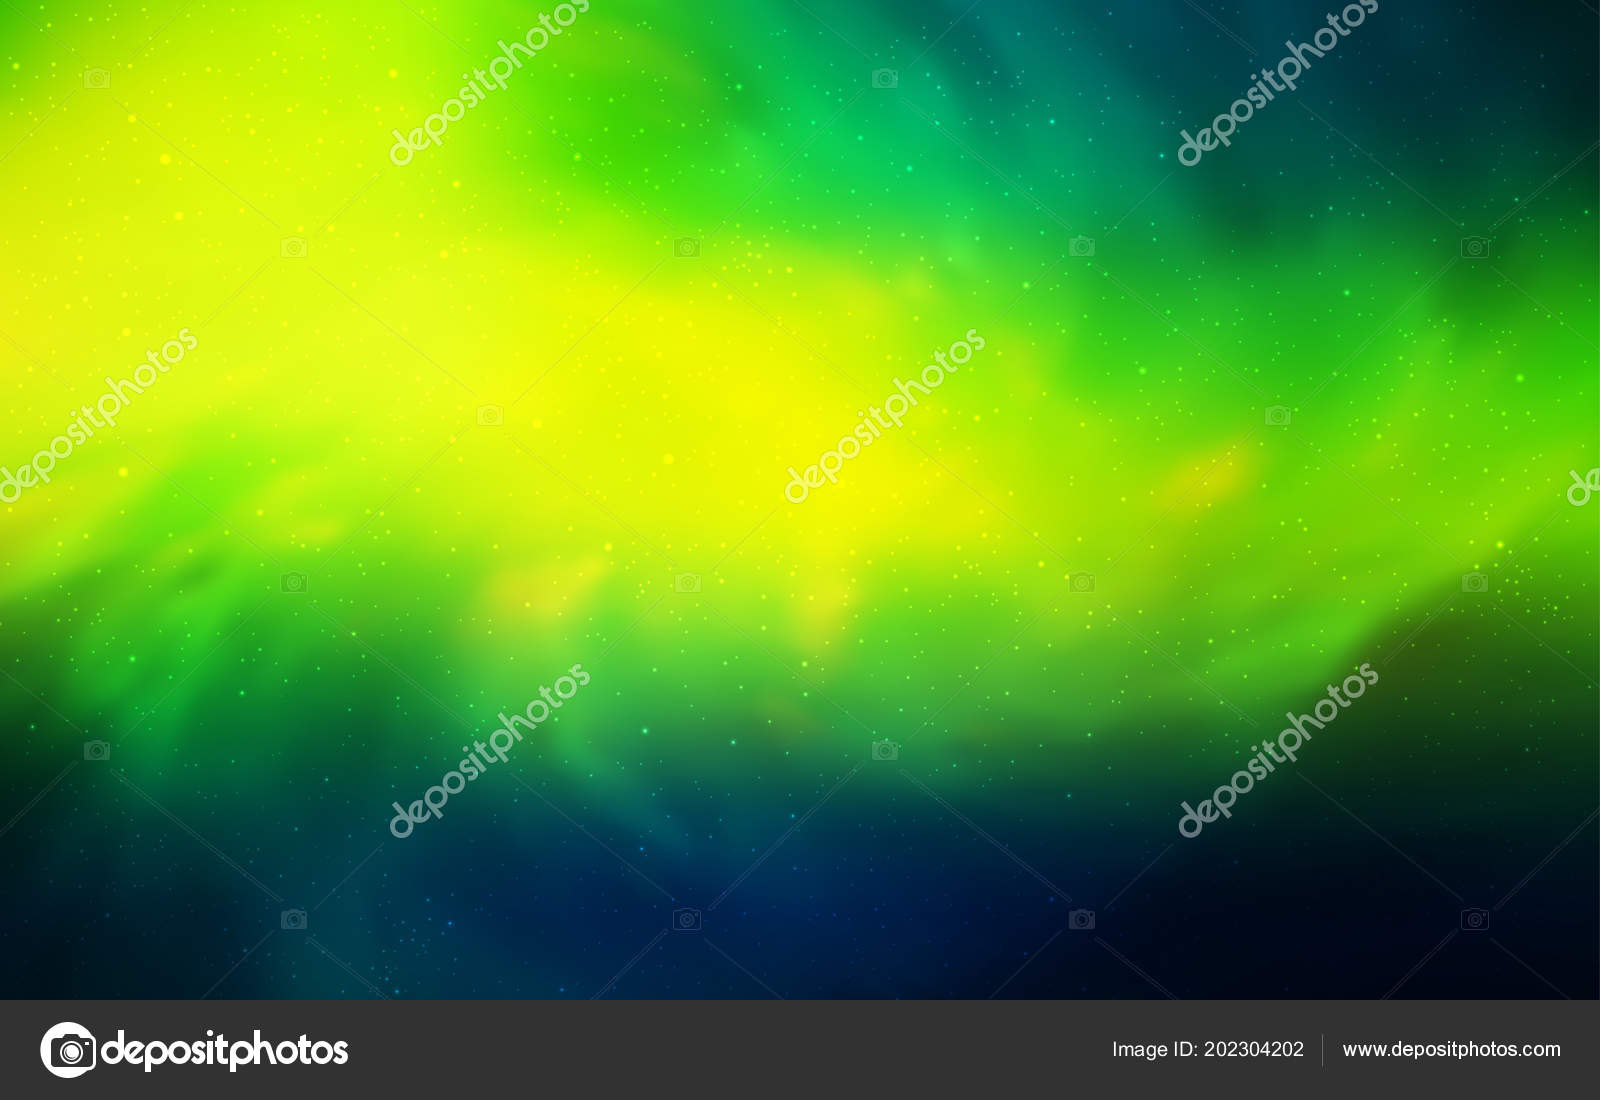 depositphotos 202304202 stock illustration dark green yellow vector background